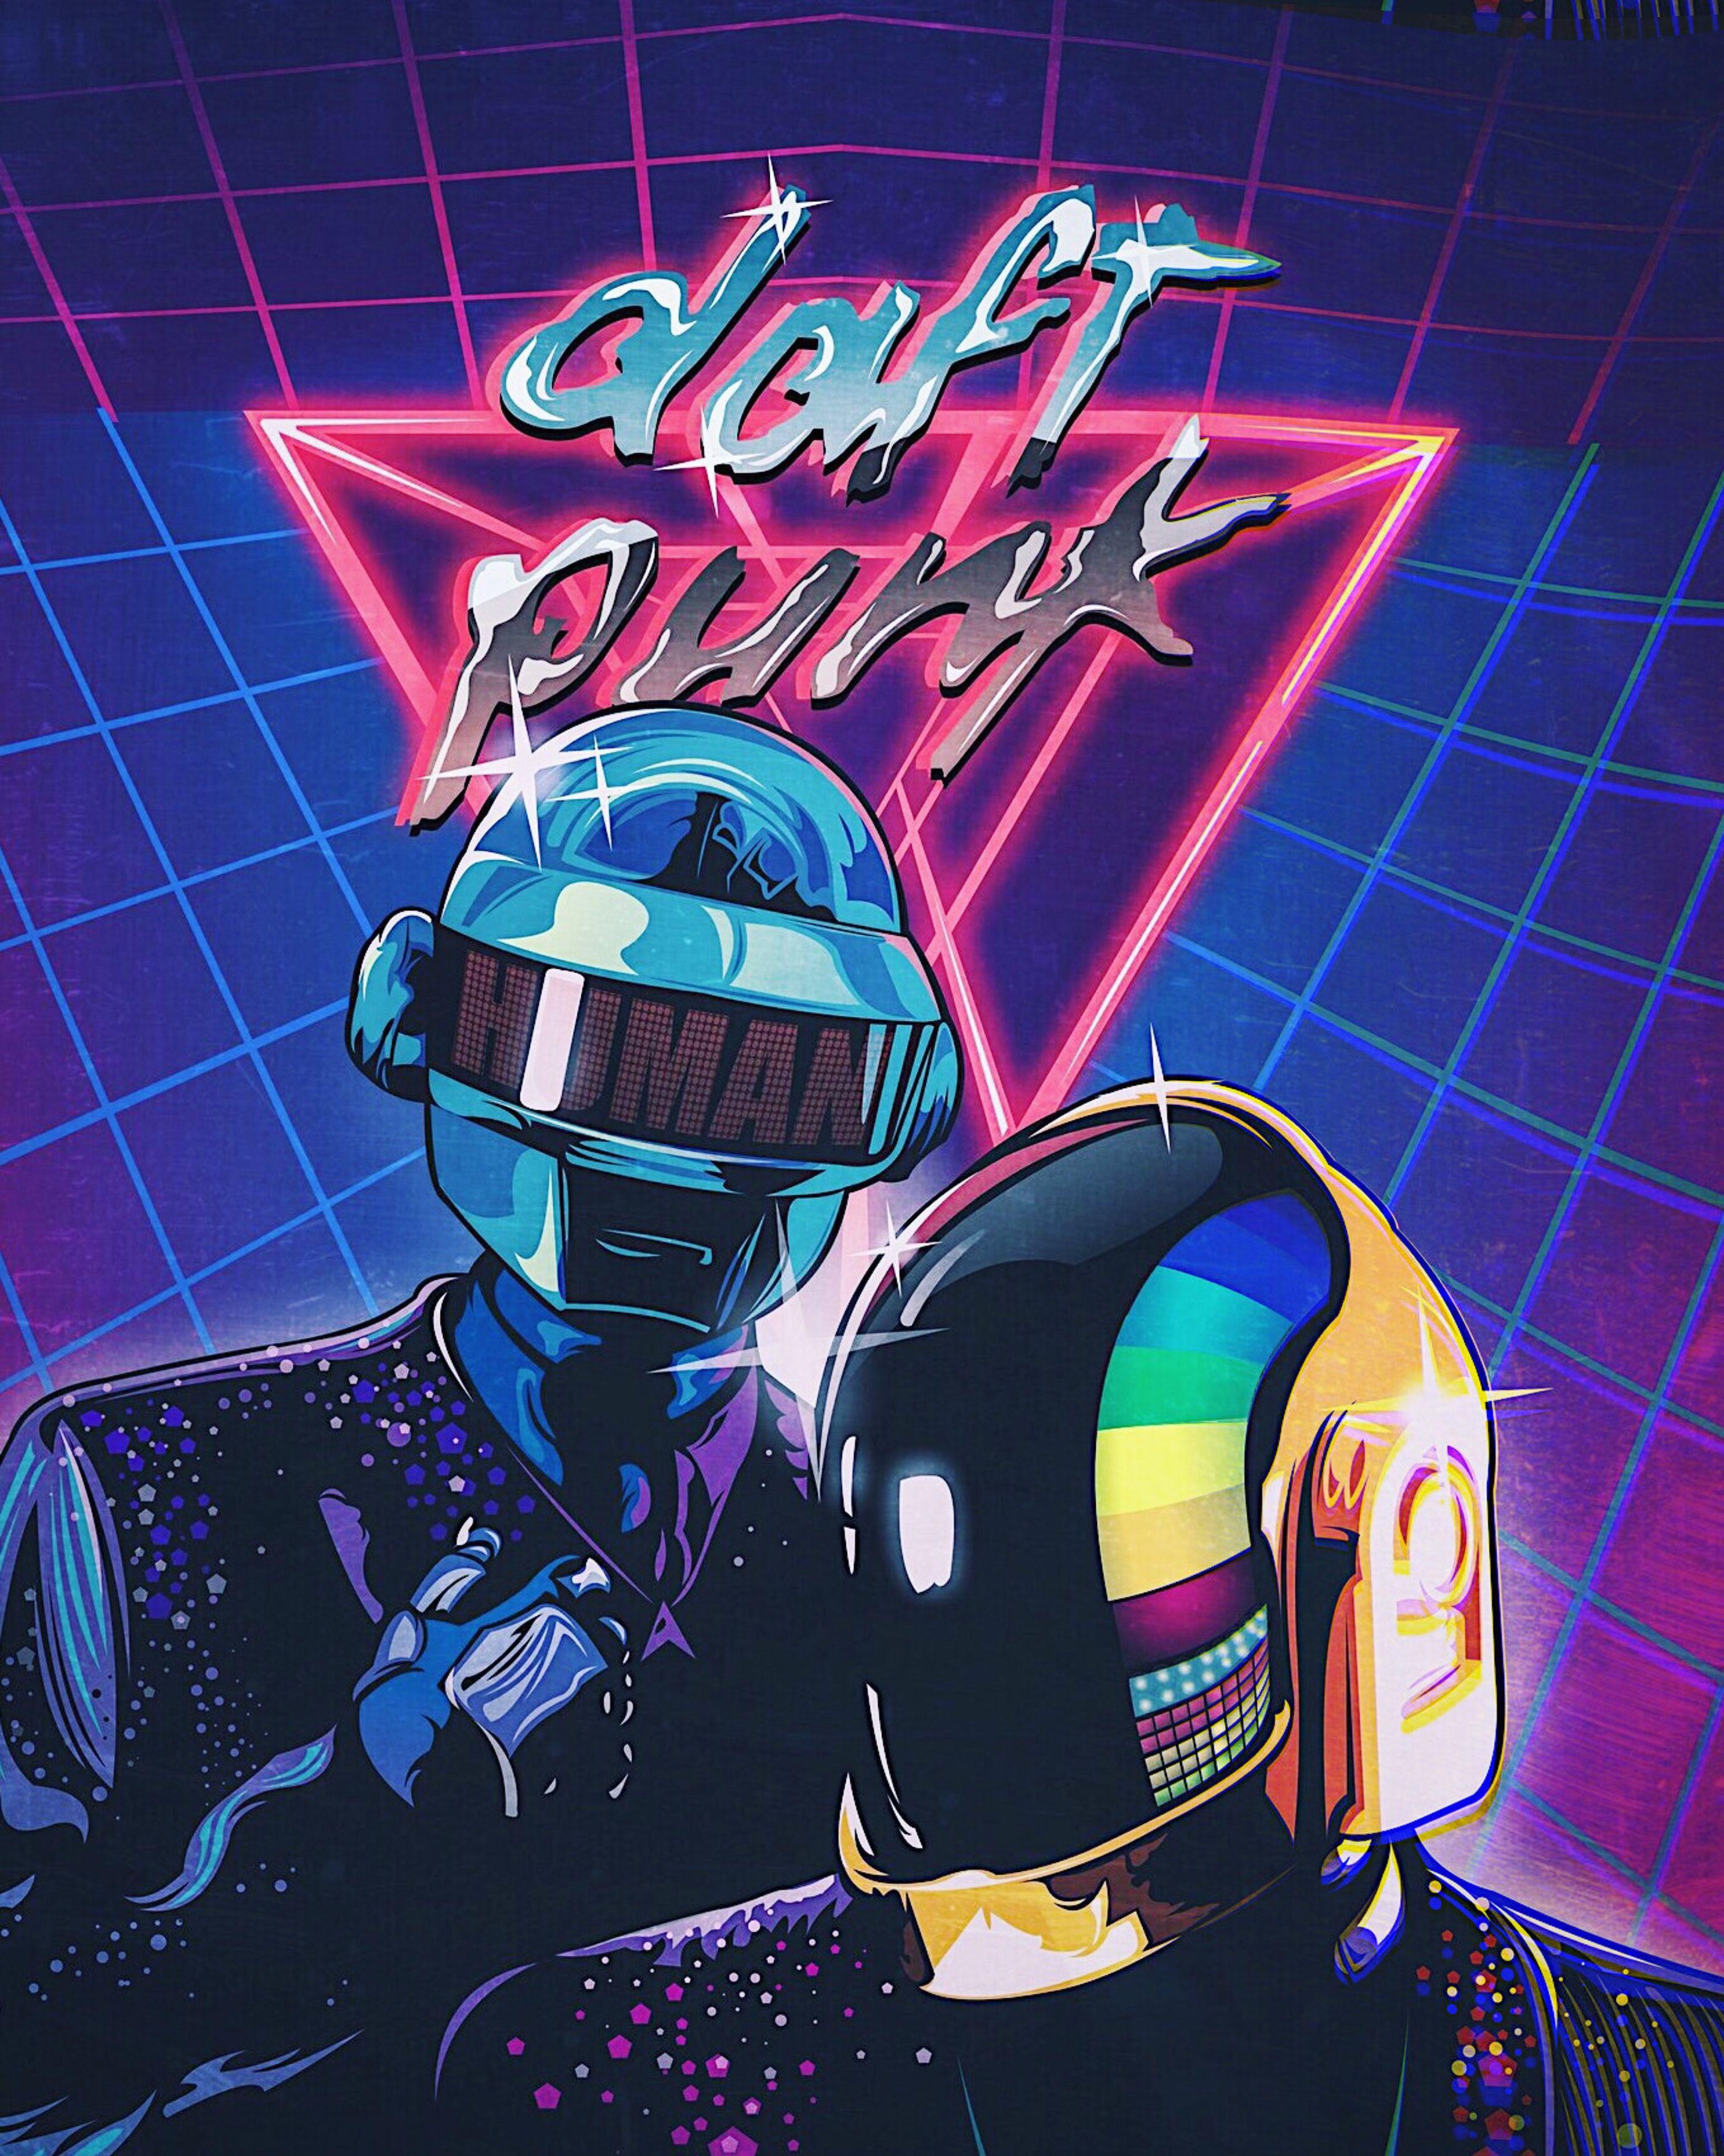 Daft Punk Iphone 11 Wallpaper - Wallpaper Download